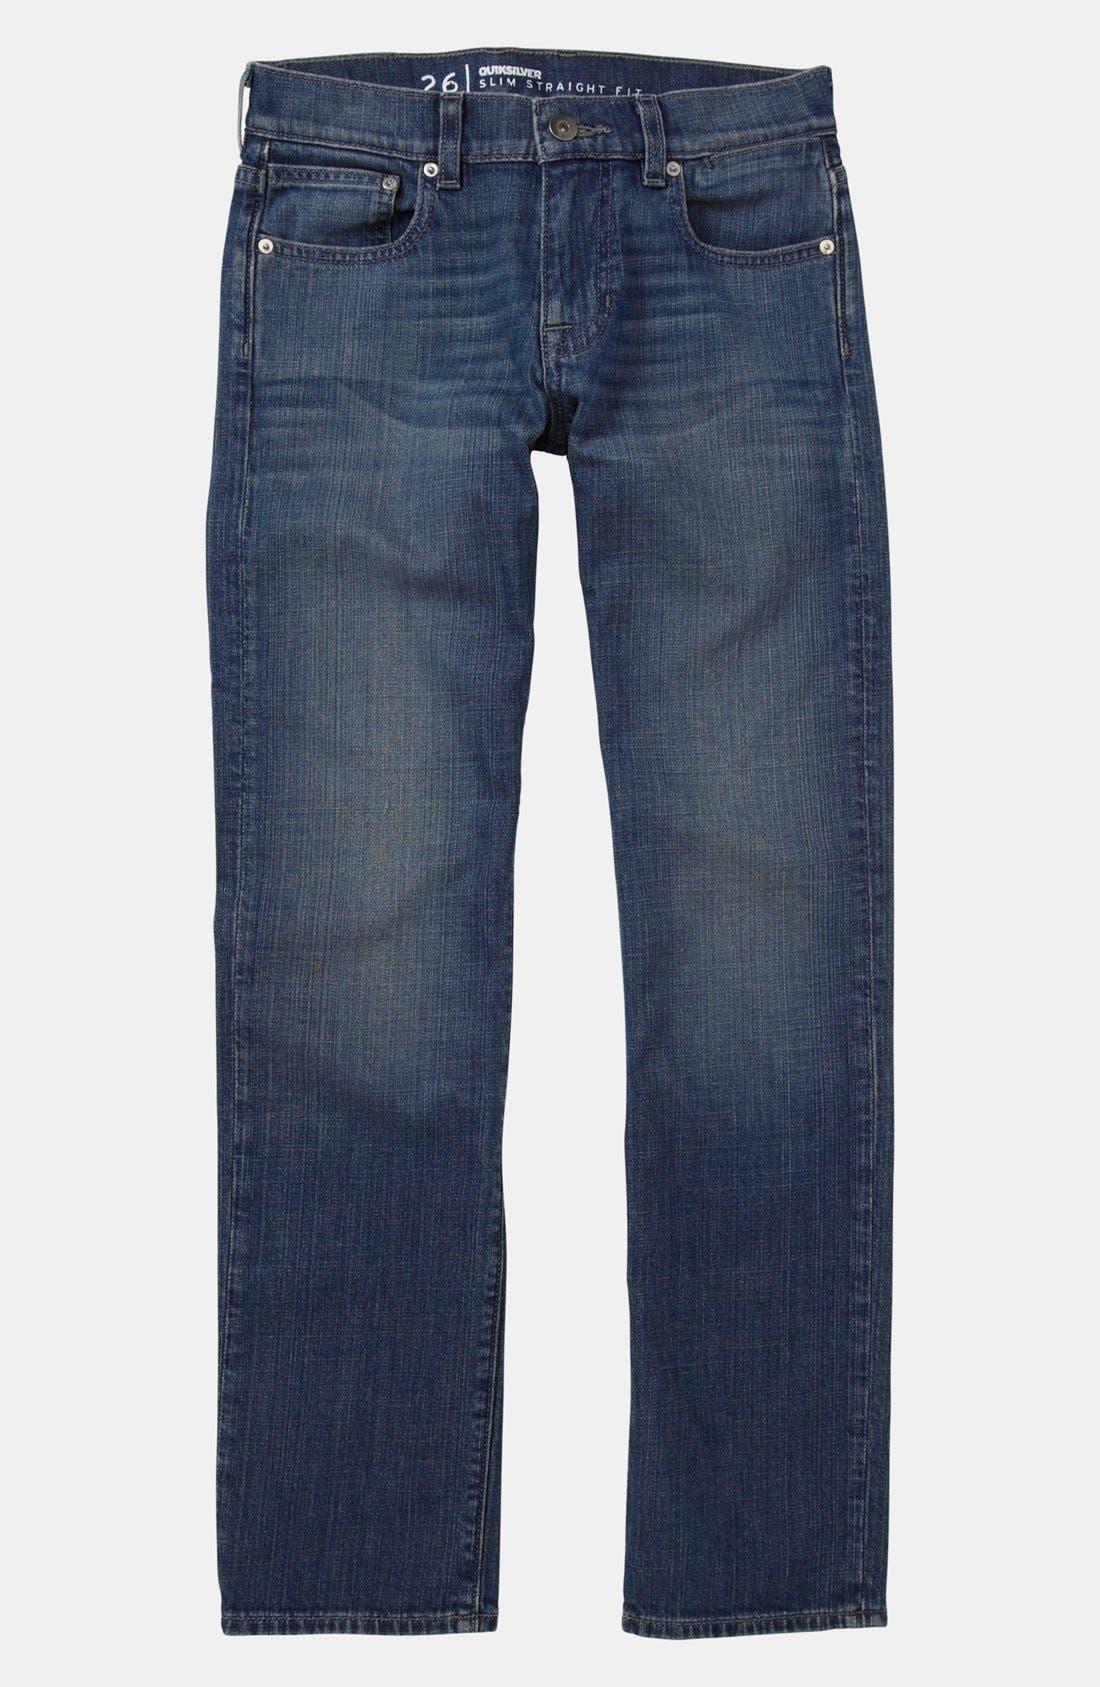 Alternate Image 2  - Quiksilver 'Distortion' Straight Leg Jeans (Little Boys)